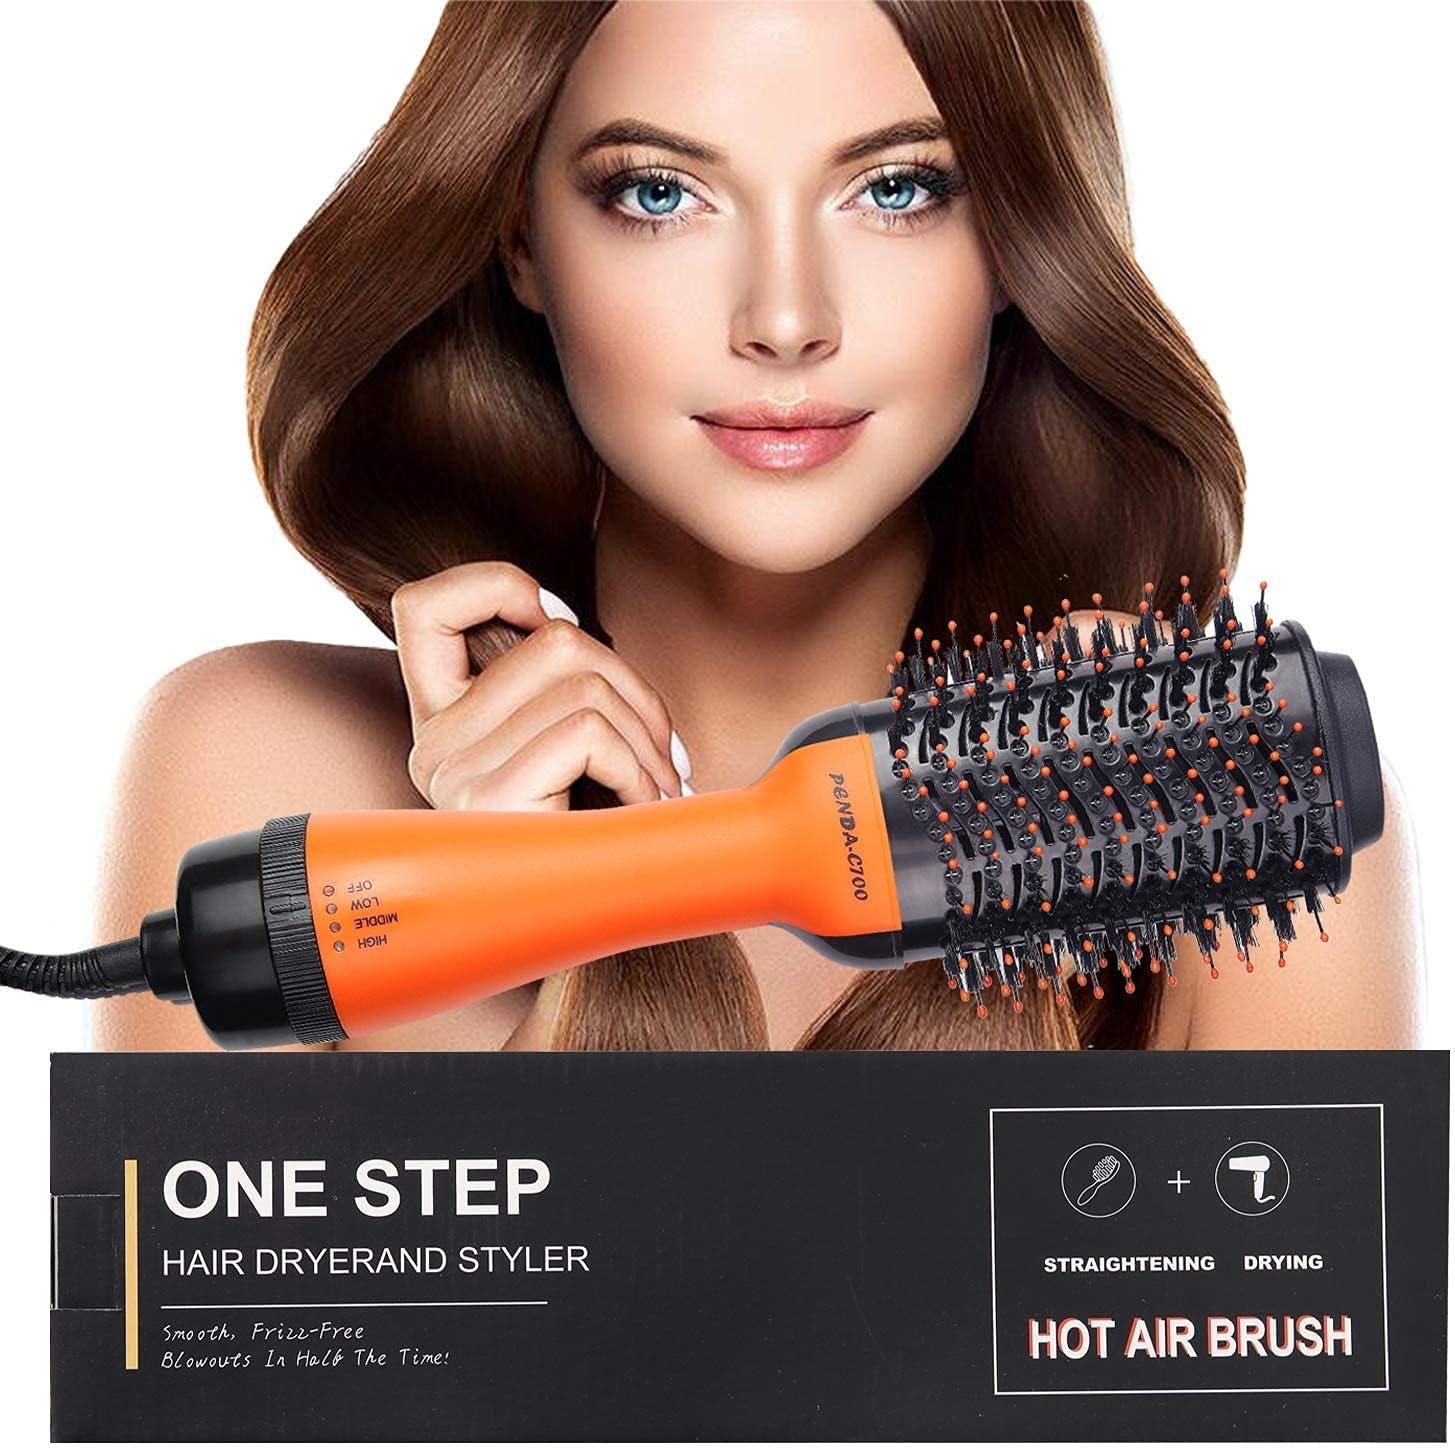 VINMEN Hot Air Brush,Hair Dryer ,Hair Dryer ,Hair Curler,Hair Straightener,Hair Comb, 4 in 1 Multifunctional hot air Comb,Hair Styling Tools , for Fast Drying,Straightening,Curling.(Black Orange): Health & Personal Care